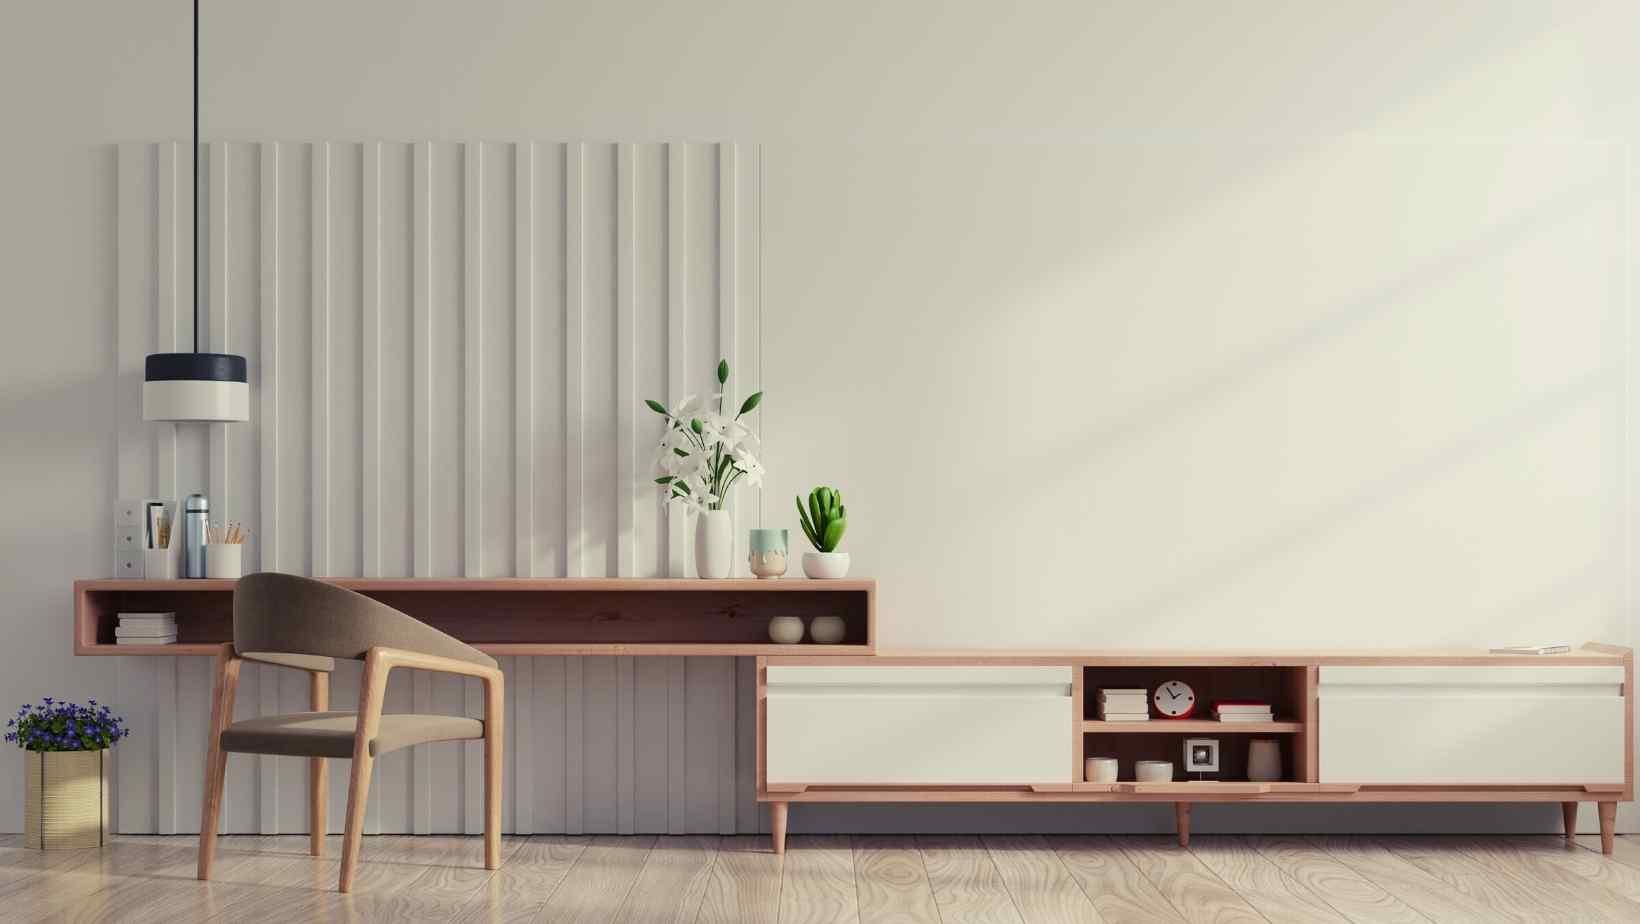 Tendências de design de interiores minimalistas